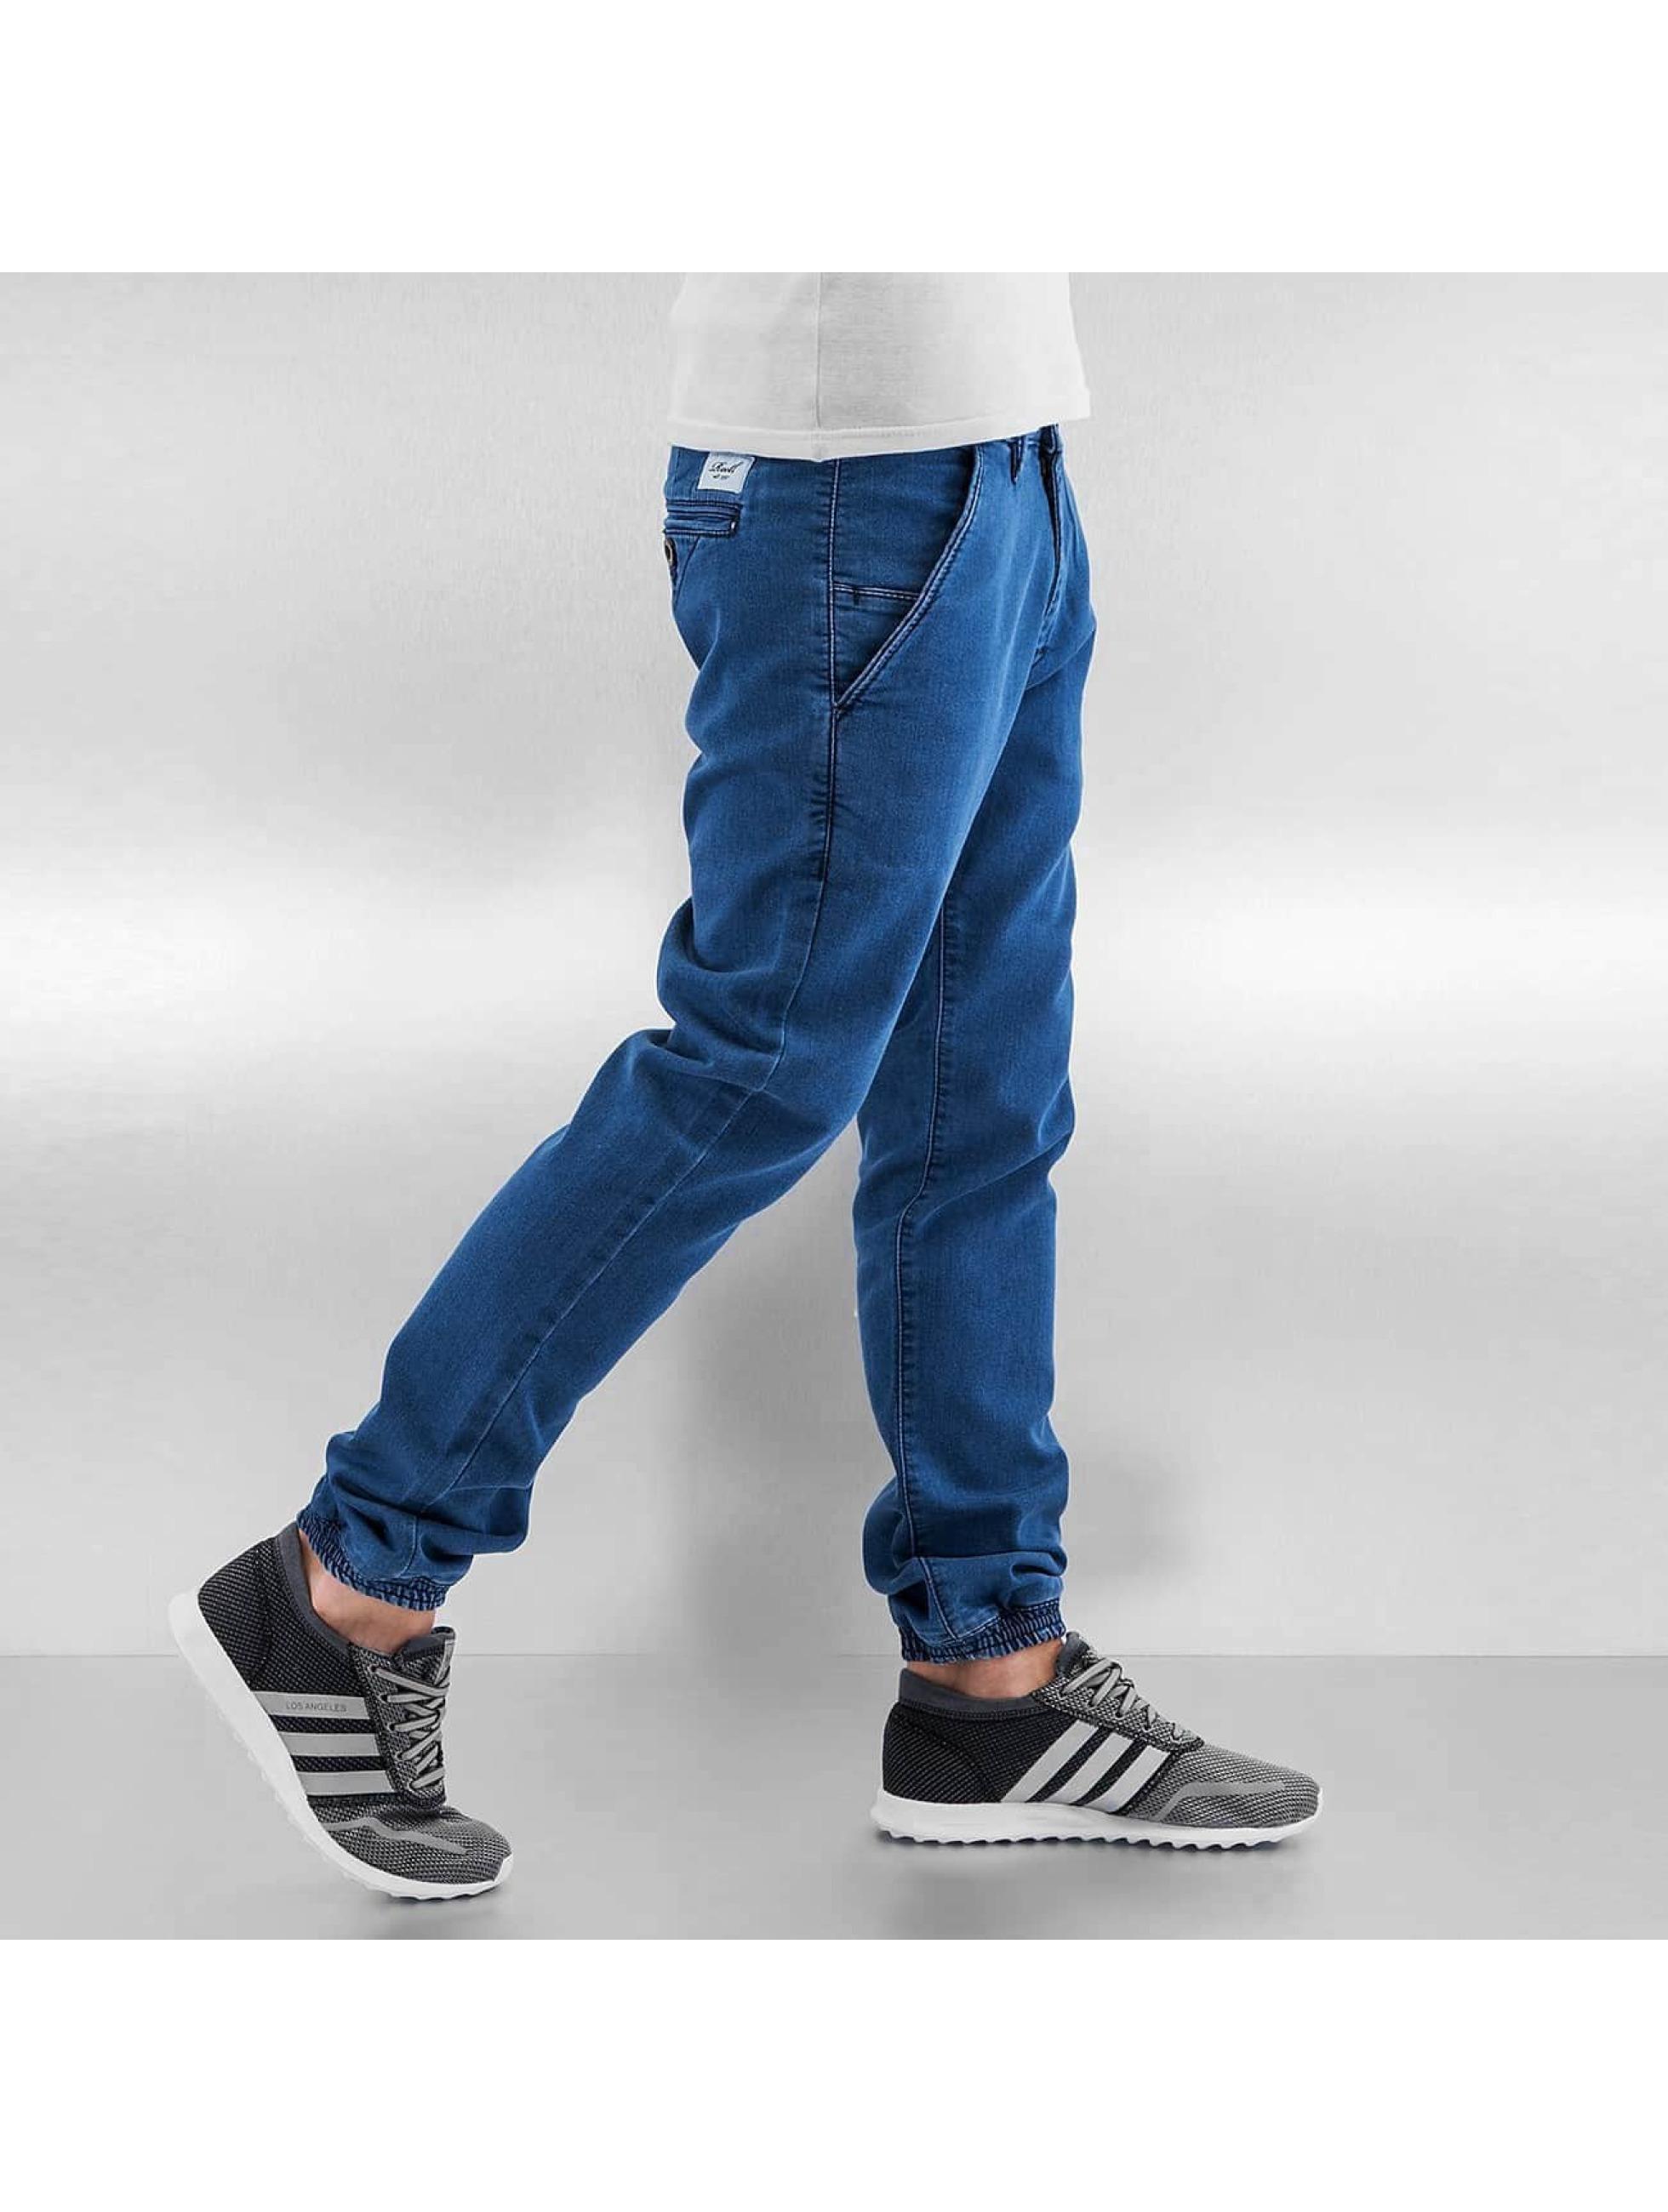 reell jeans herren hosen chino jogger ebay. Black Bedroom Furniture Sets. Home Design Ideas